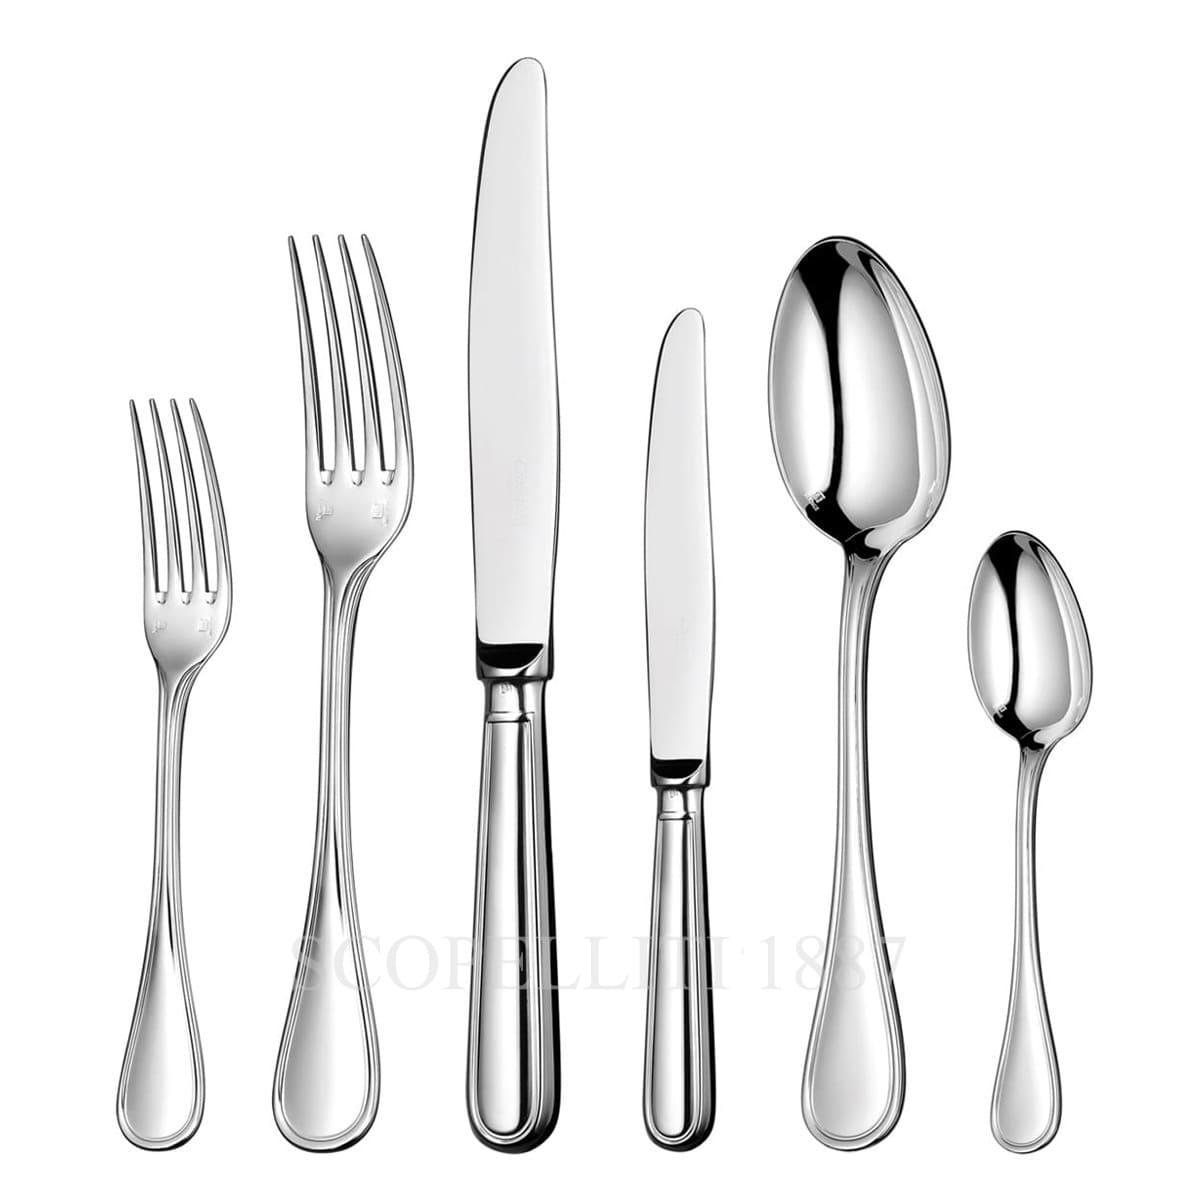 christofle flatware albi silver plated